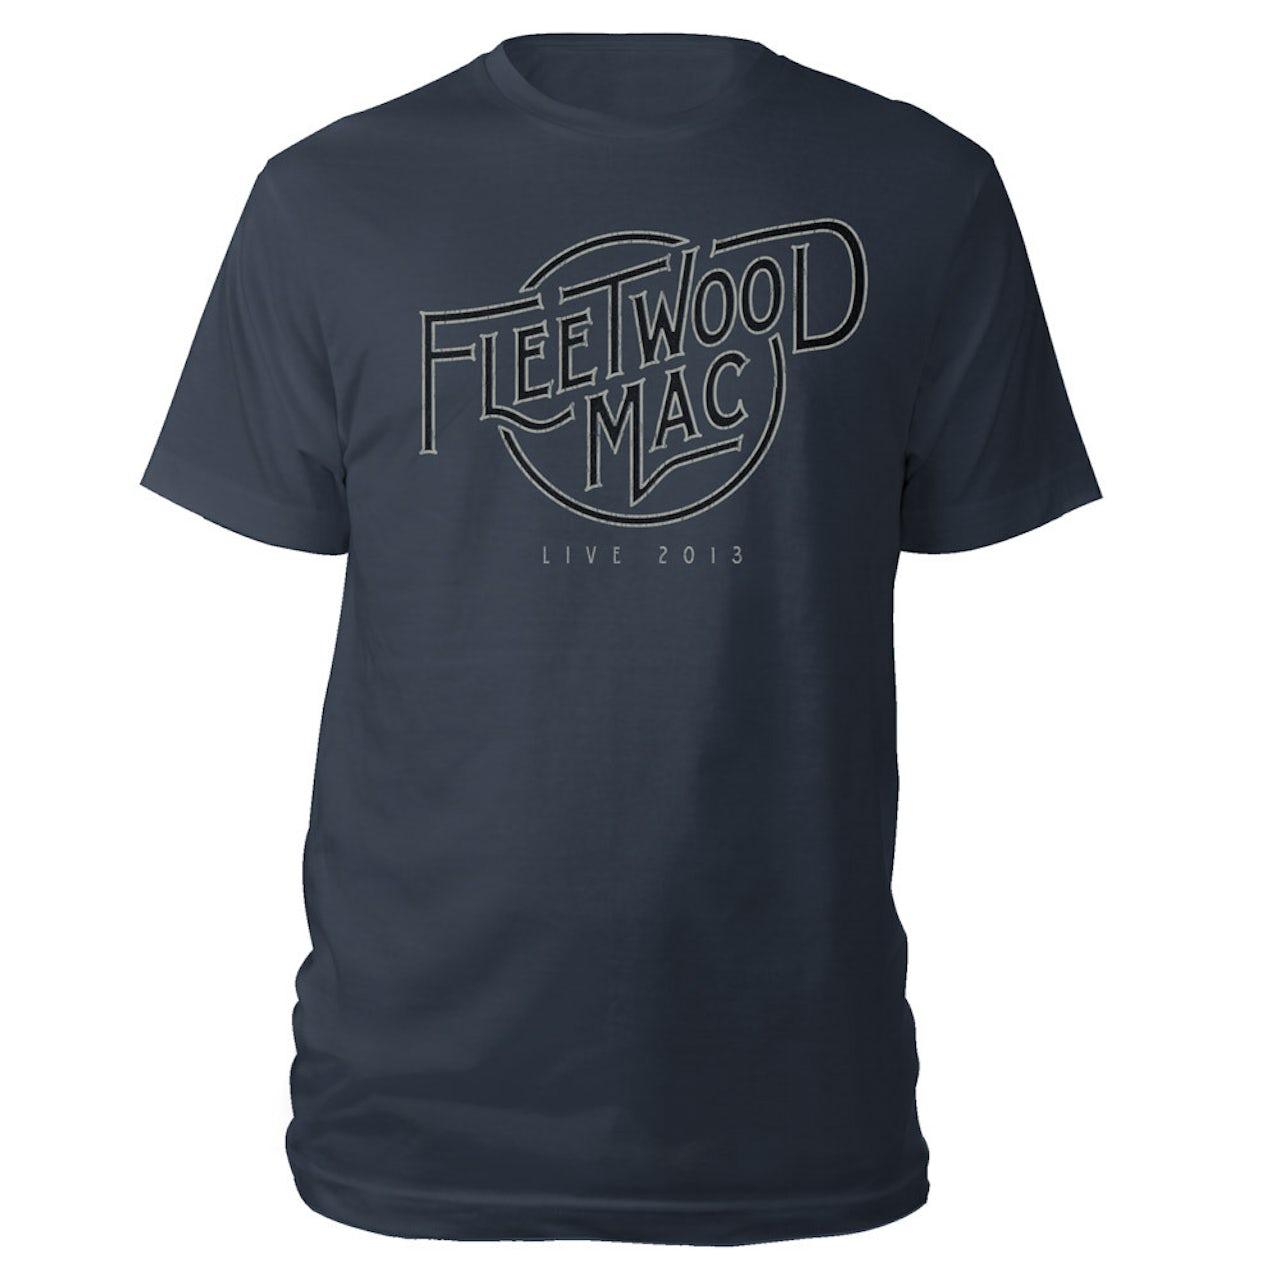 8df0737c2 Fleetwood Mac Live Logo Tee